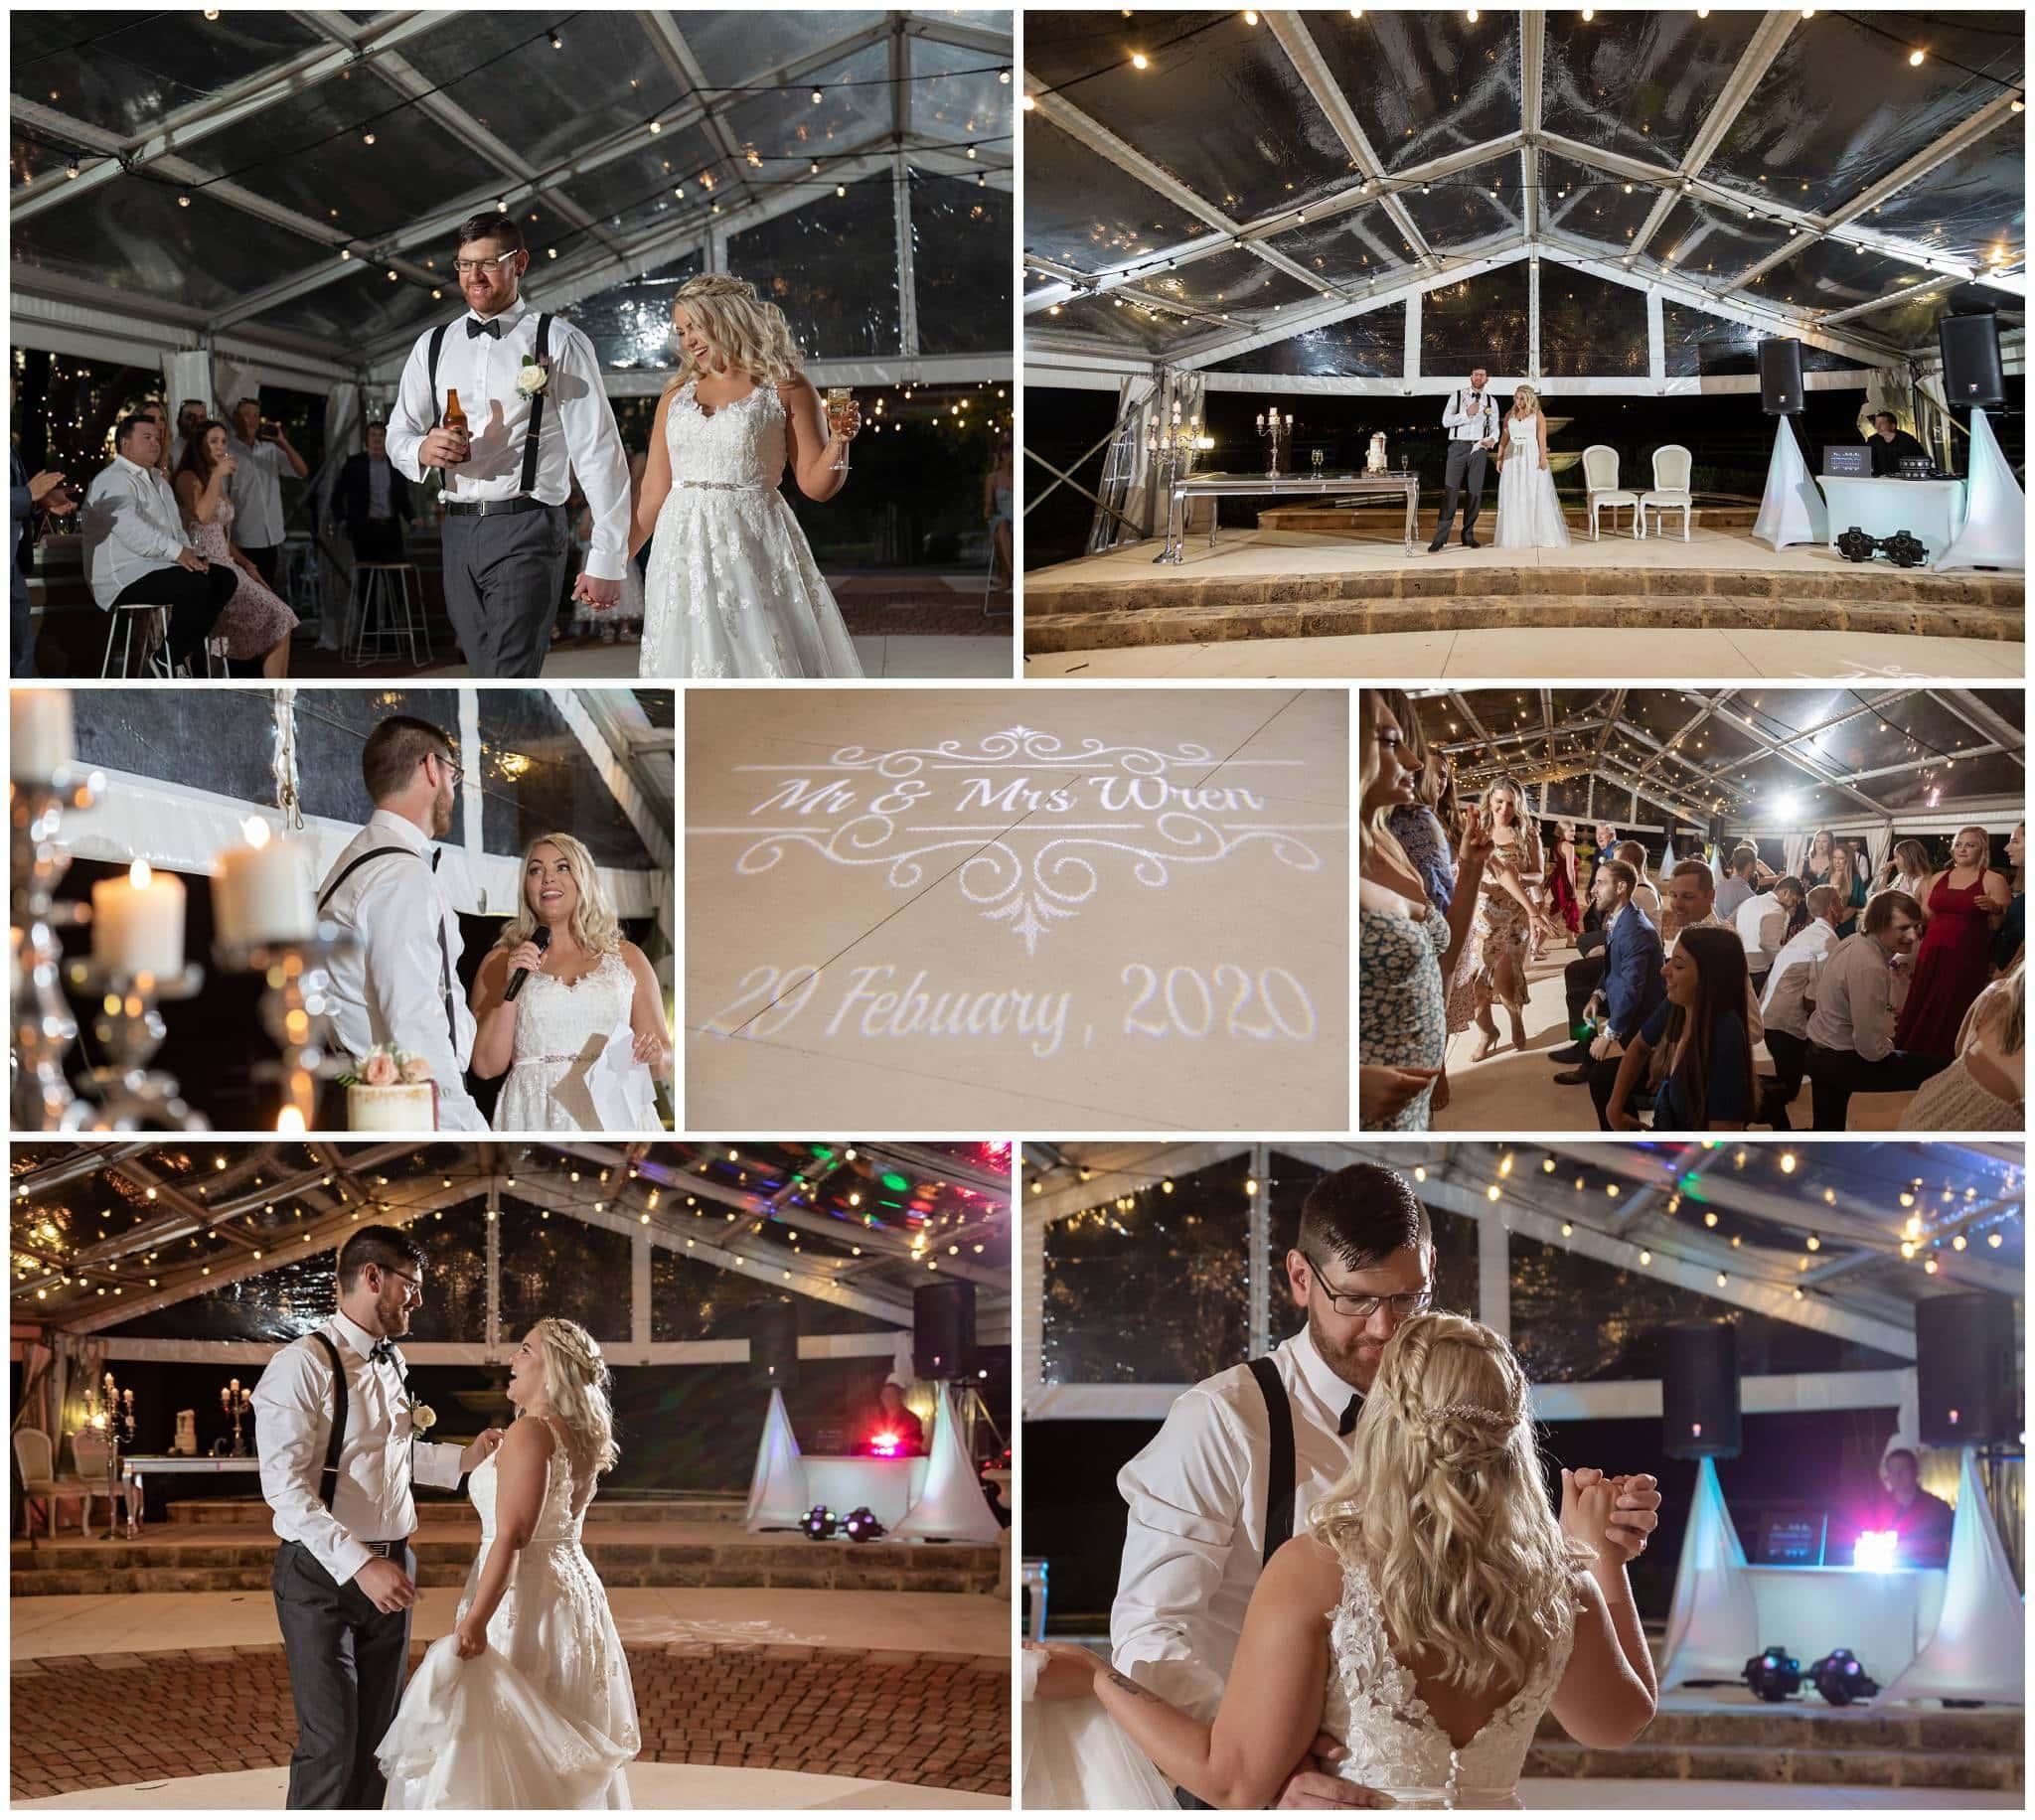 Perth Wedding Photography and DJ/MC Pacakge